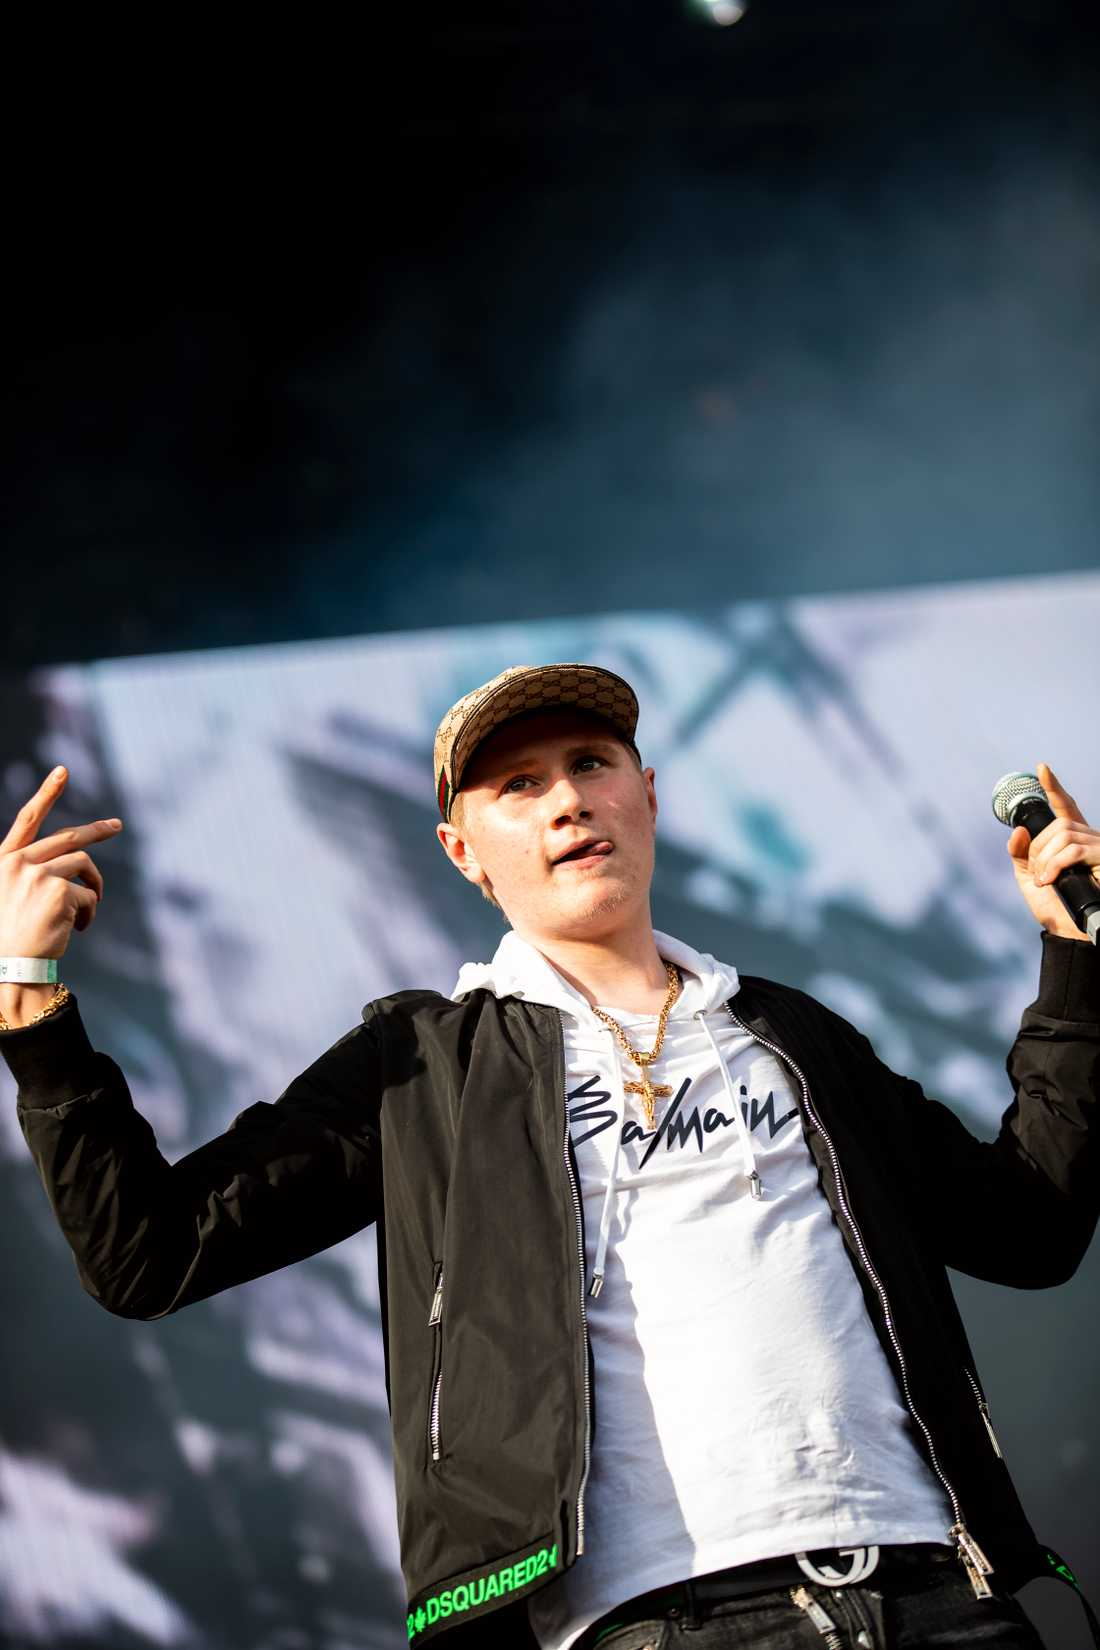 Einár uppträder på festivalen Smash